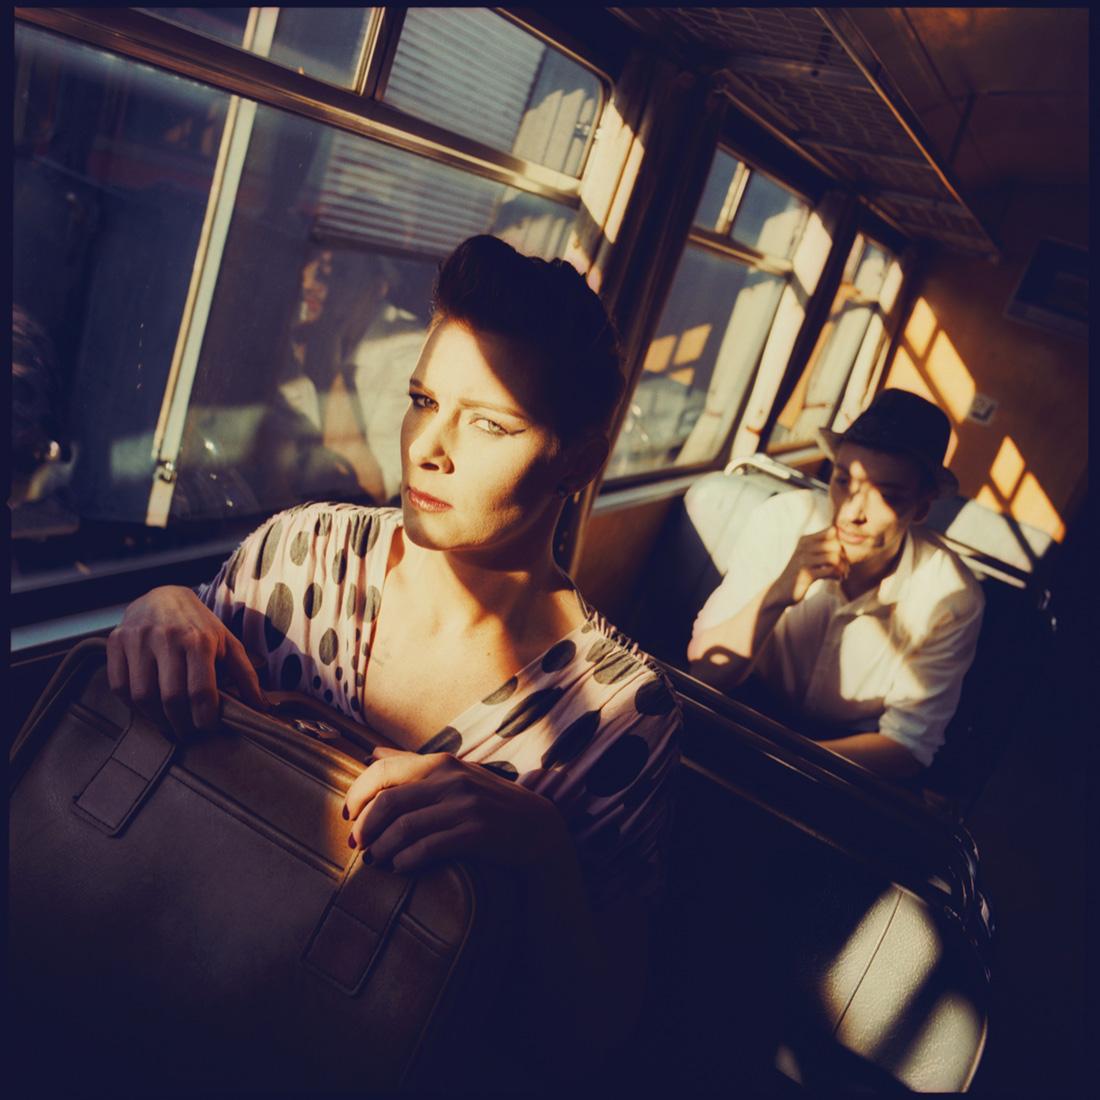 Analogfotografie * Hasselblad 500c/m * Mittelformatfotografie * Rossi Photography